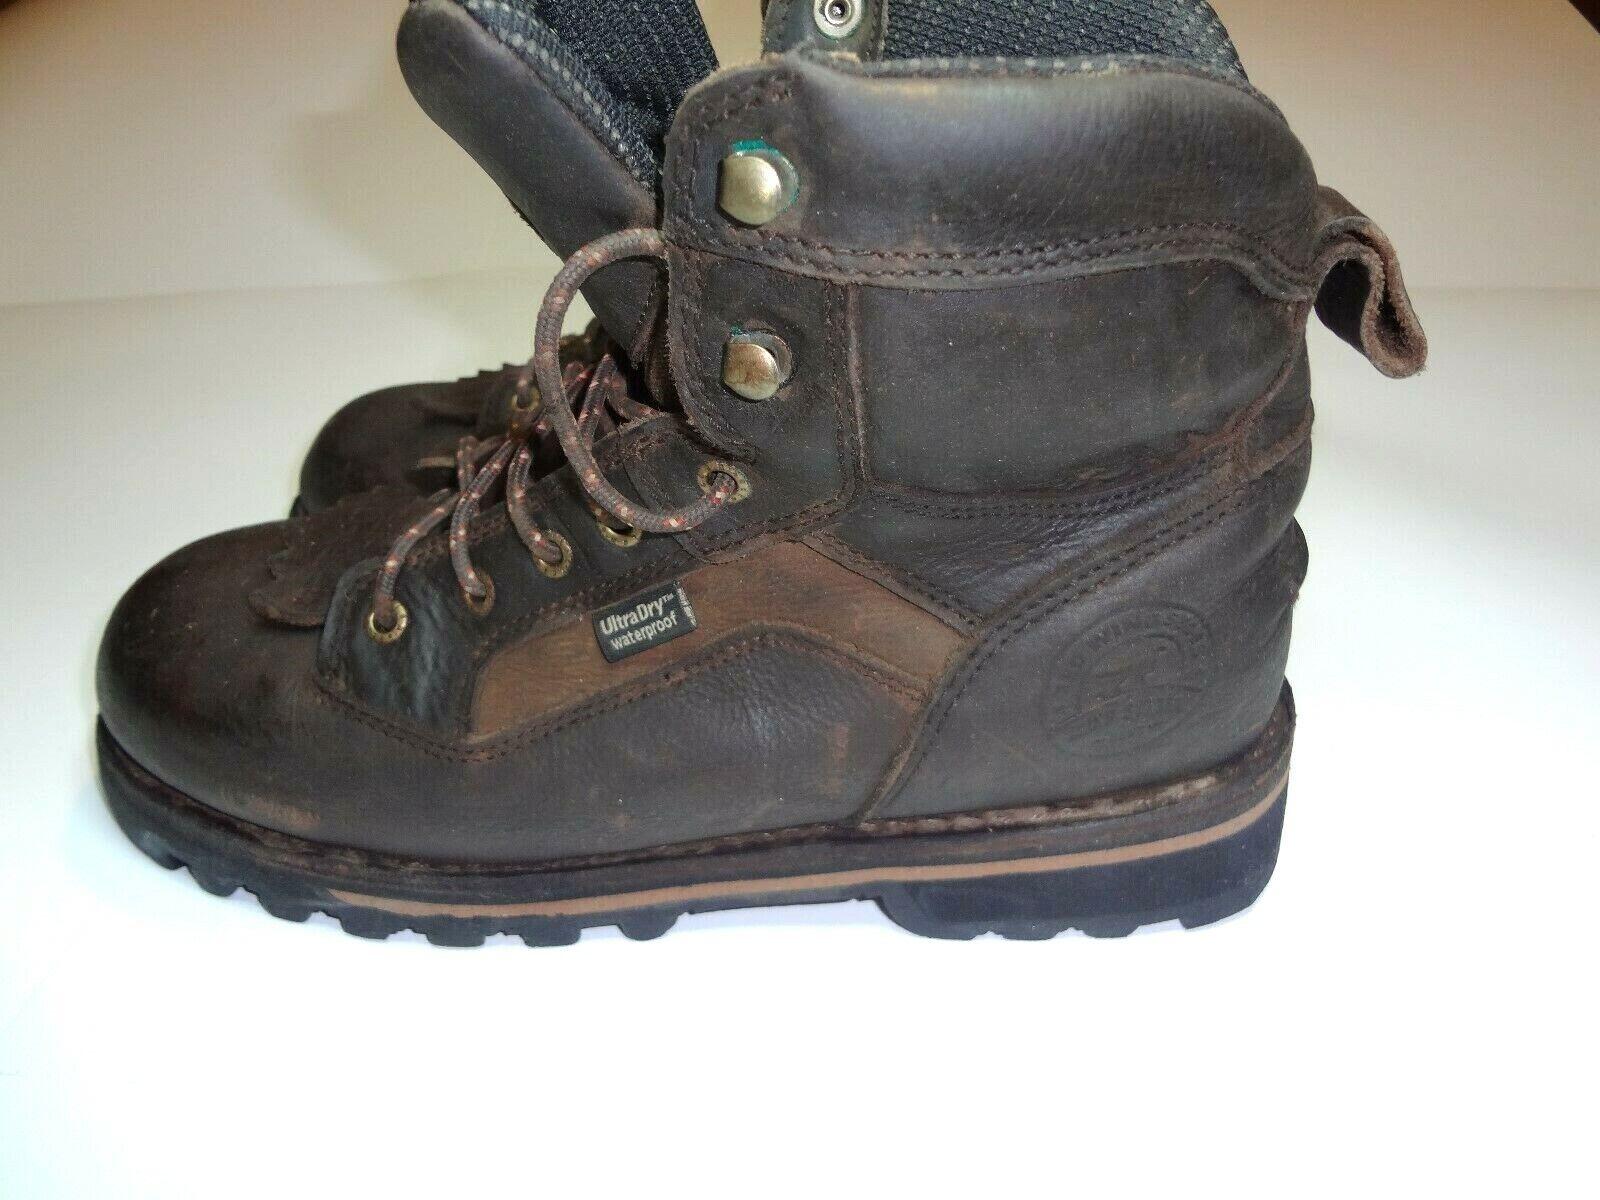 IRISH SETTER 878 Trailblazer Waterproof 7  Big Game Hunting Boot Mens Size 9 EE